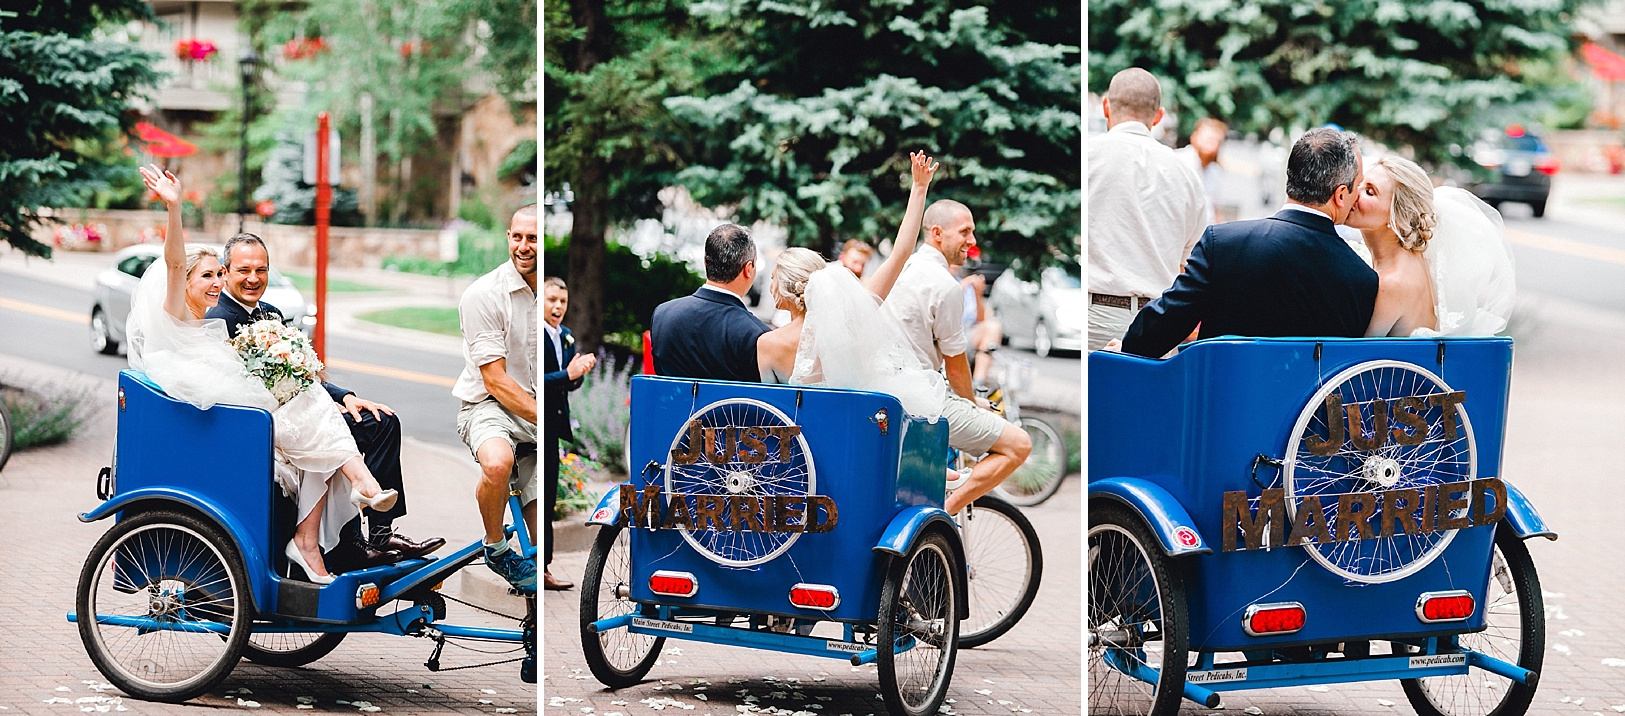 Bride and Groom taking a pedicab ride after wedding ceremony in Vail, Colorado